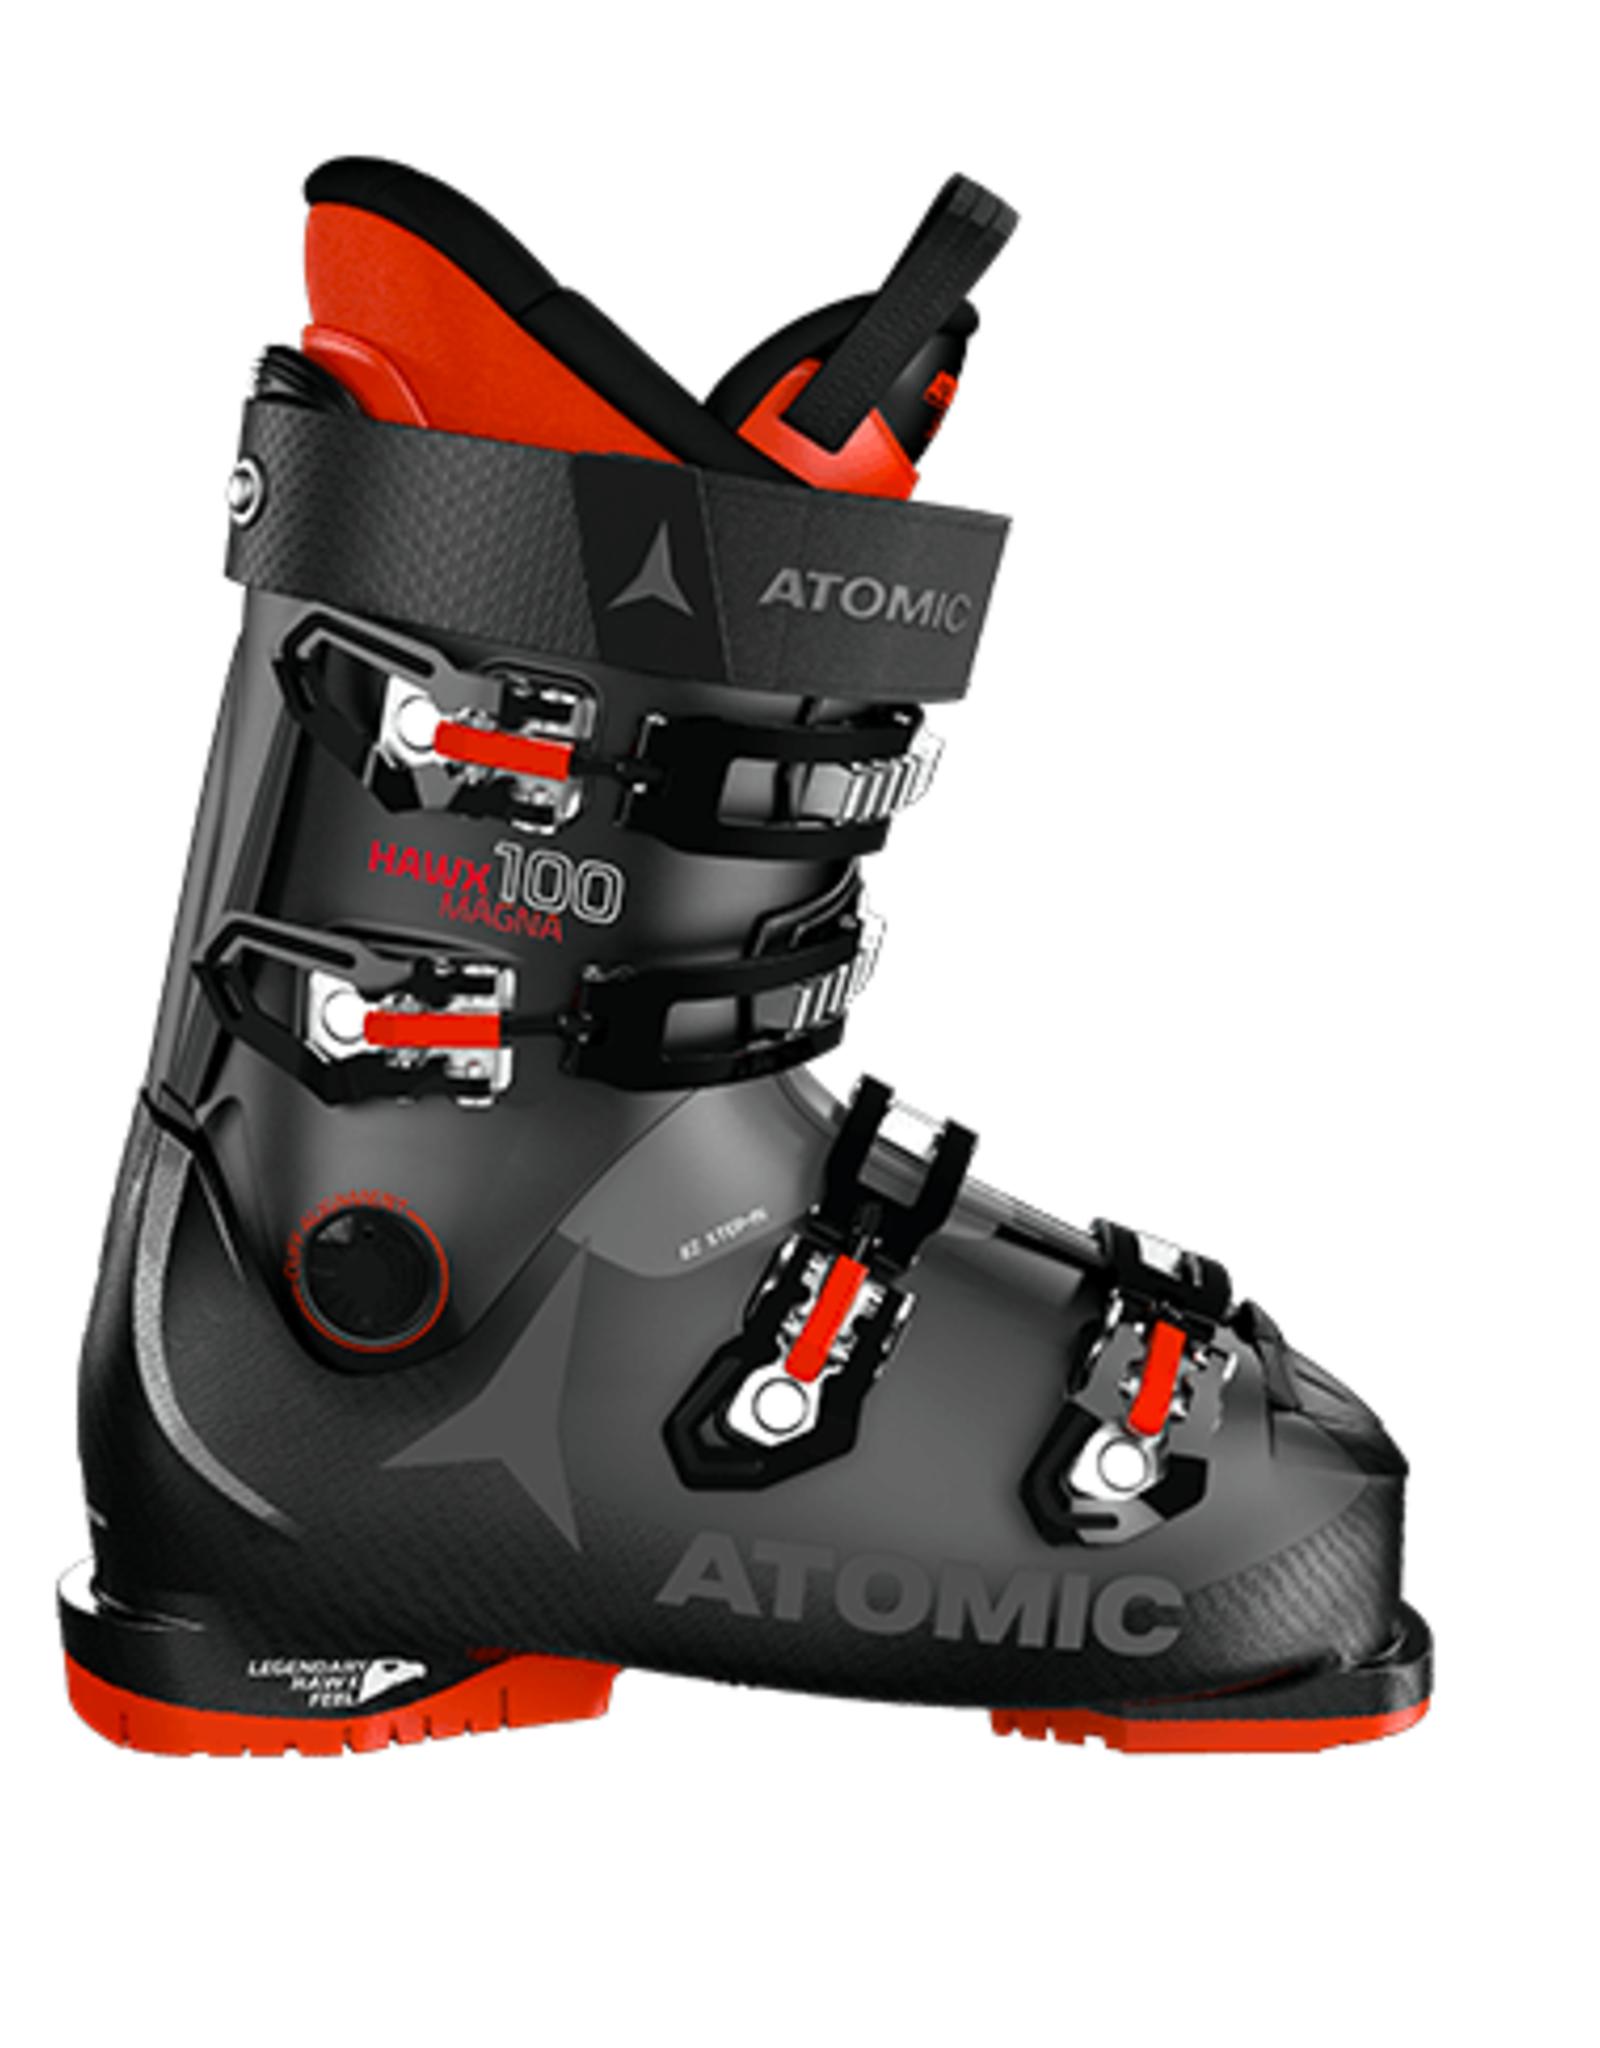 Atomic Men's Hawx Magna 100 Ski Boots Black/Anthracite/Red 2022